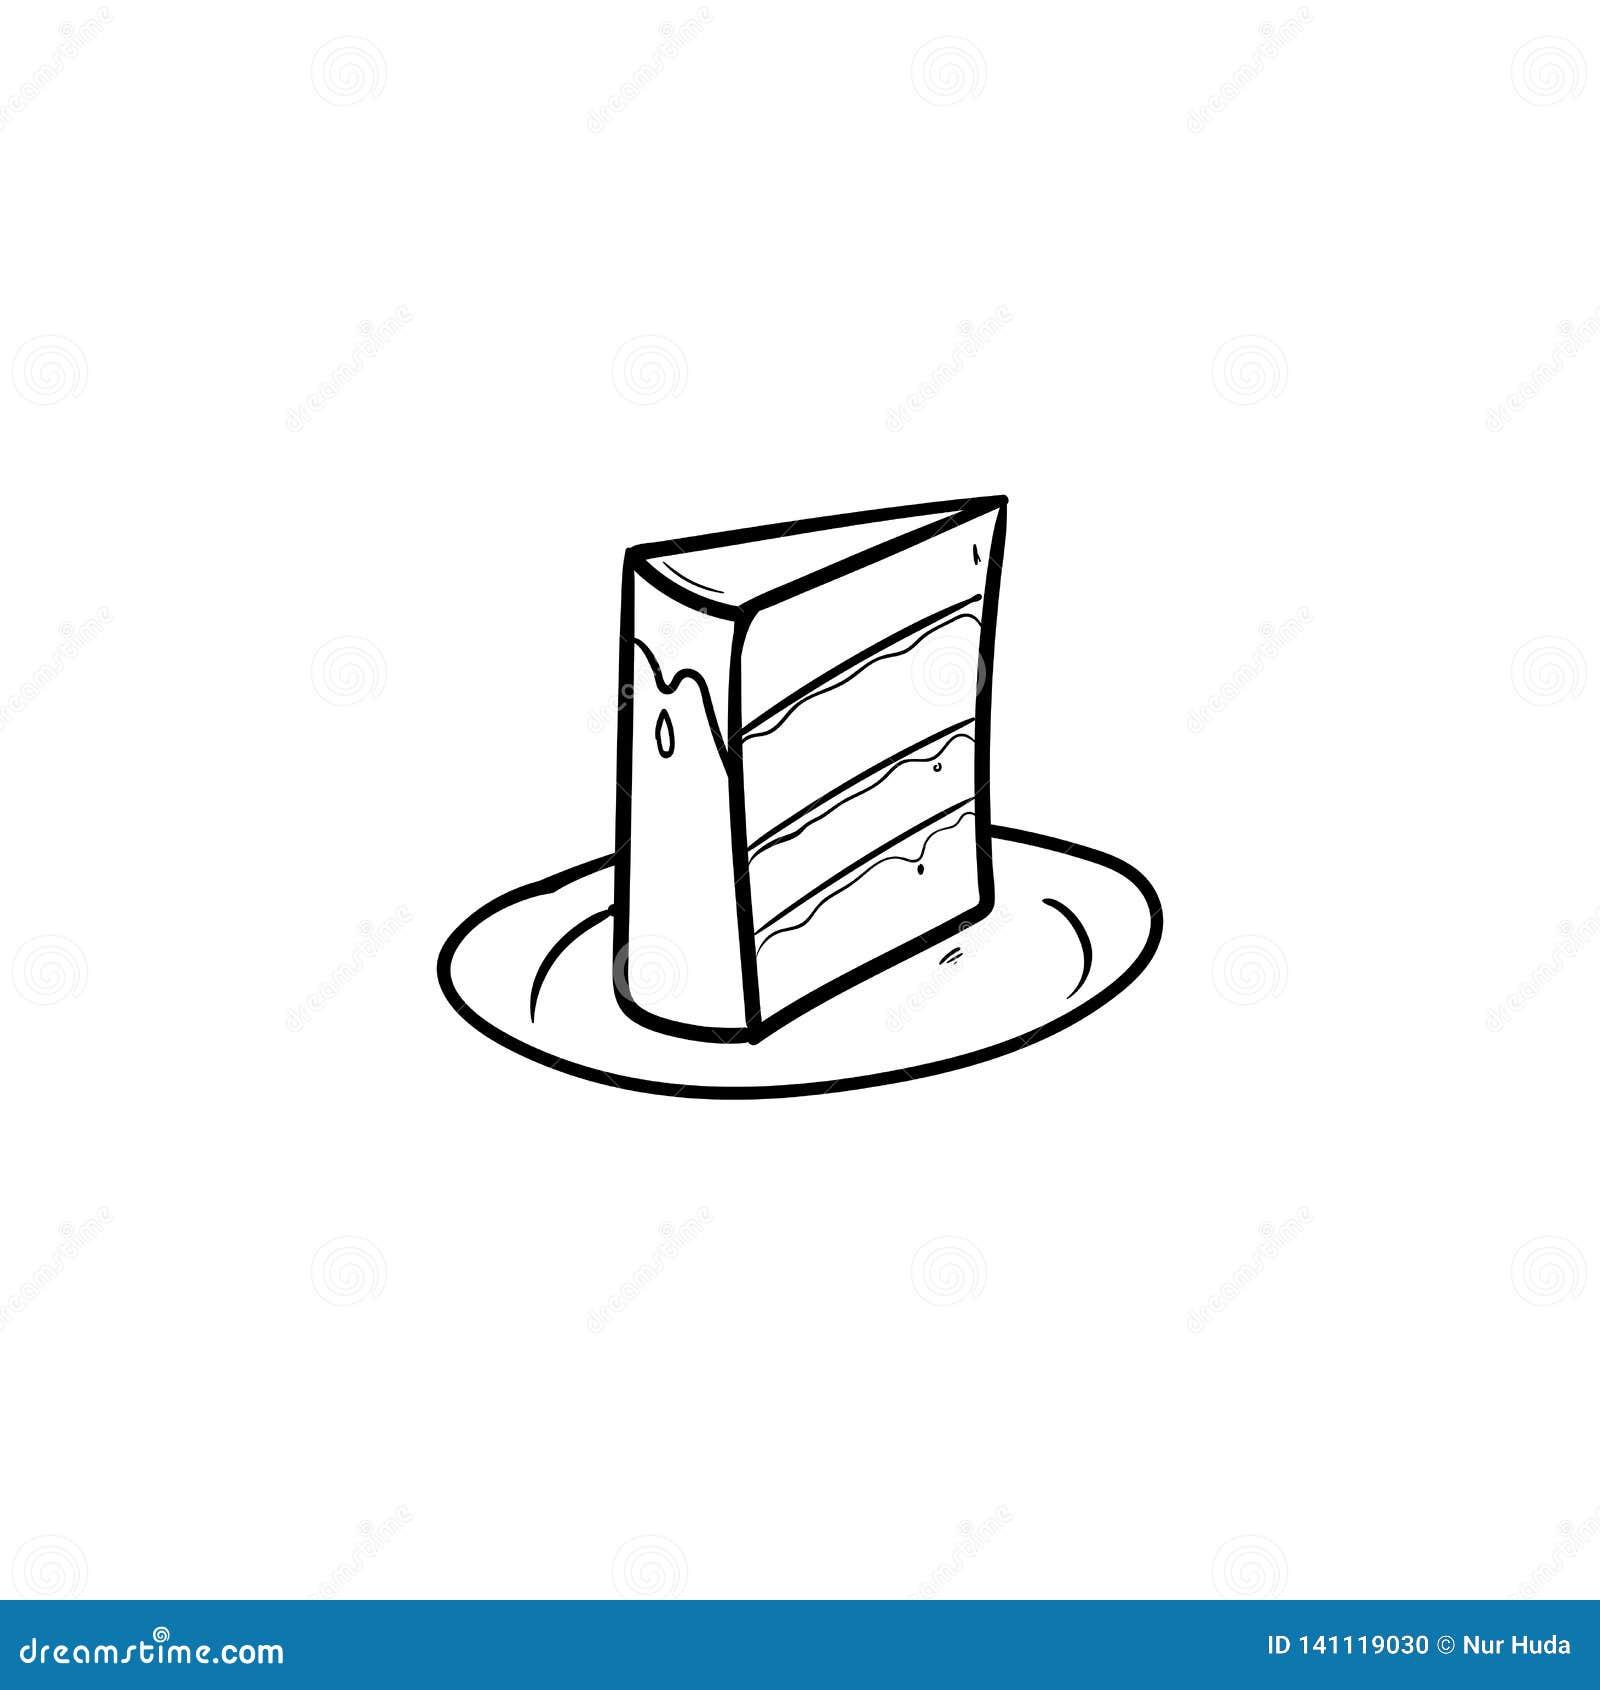 Sensational Birthday Cake With Outline Using Doodle Art Stock Vector Funny Birthday Cards Online Hendilapandamsfinfo